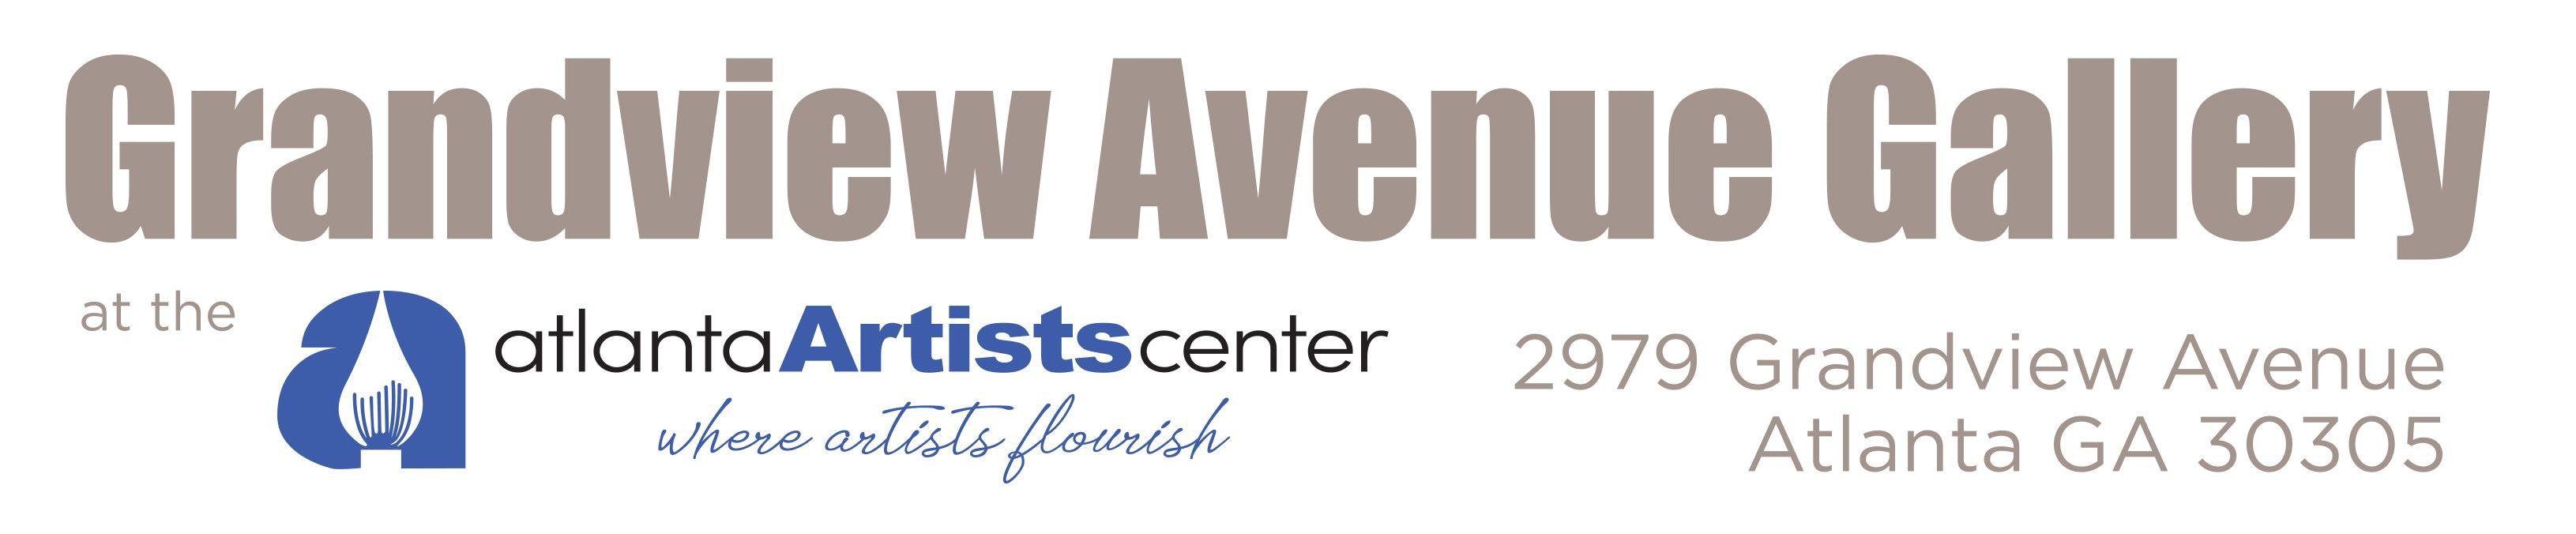 Grandview Avenue Gallery